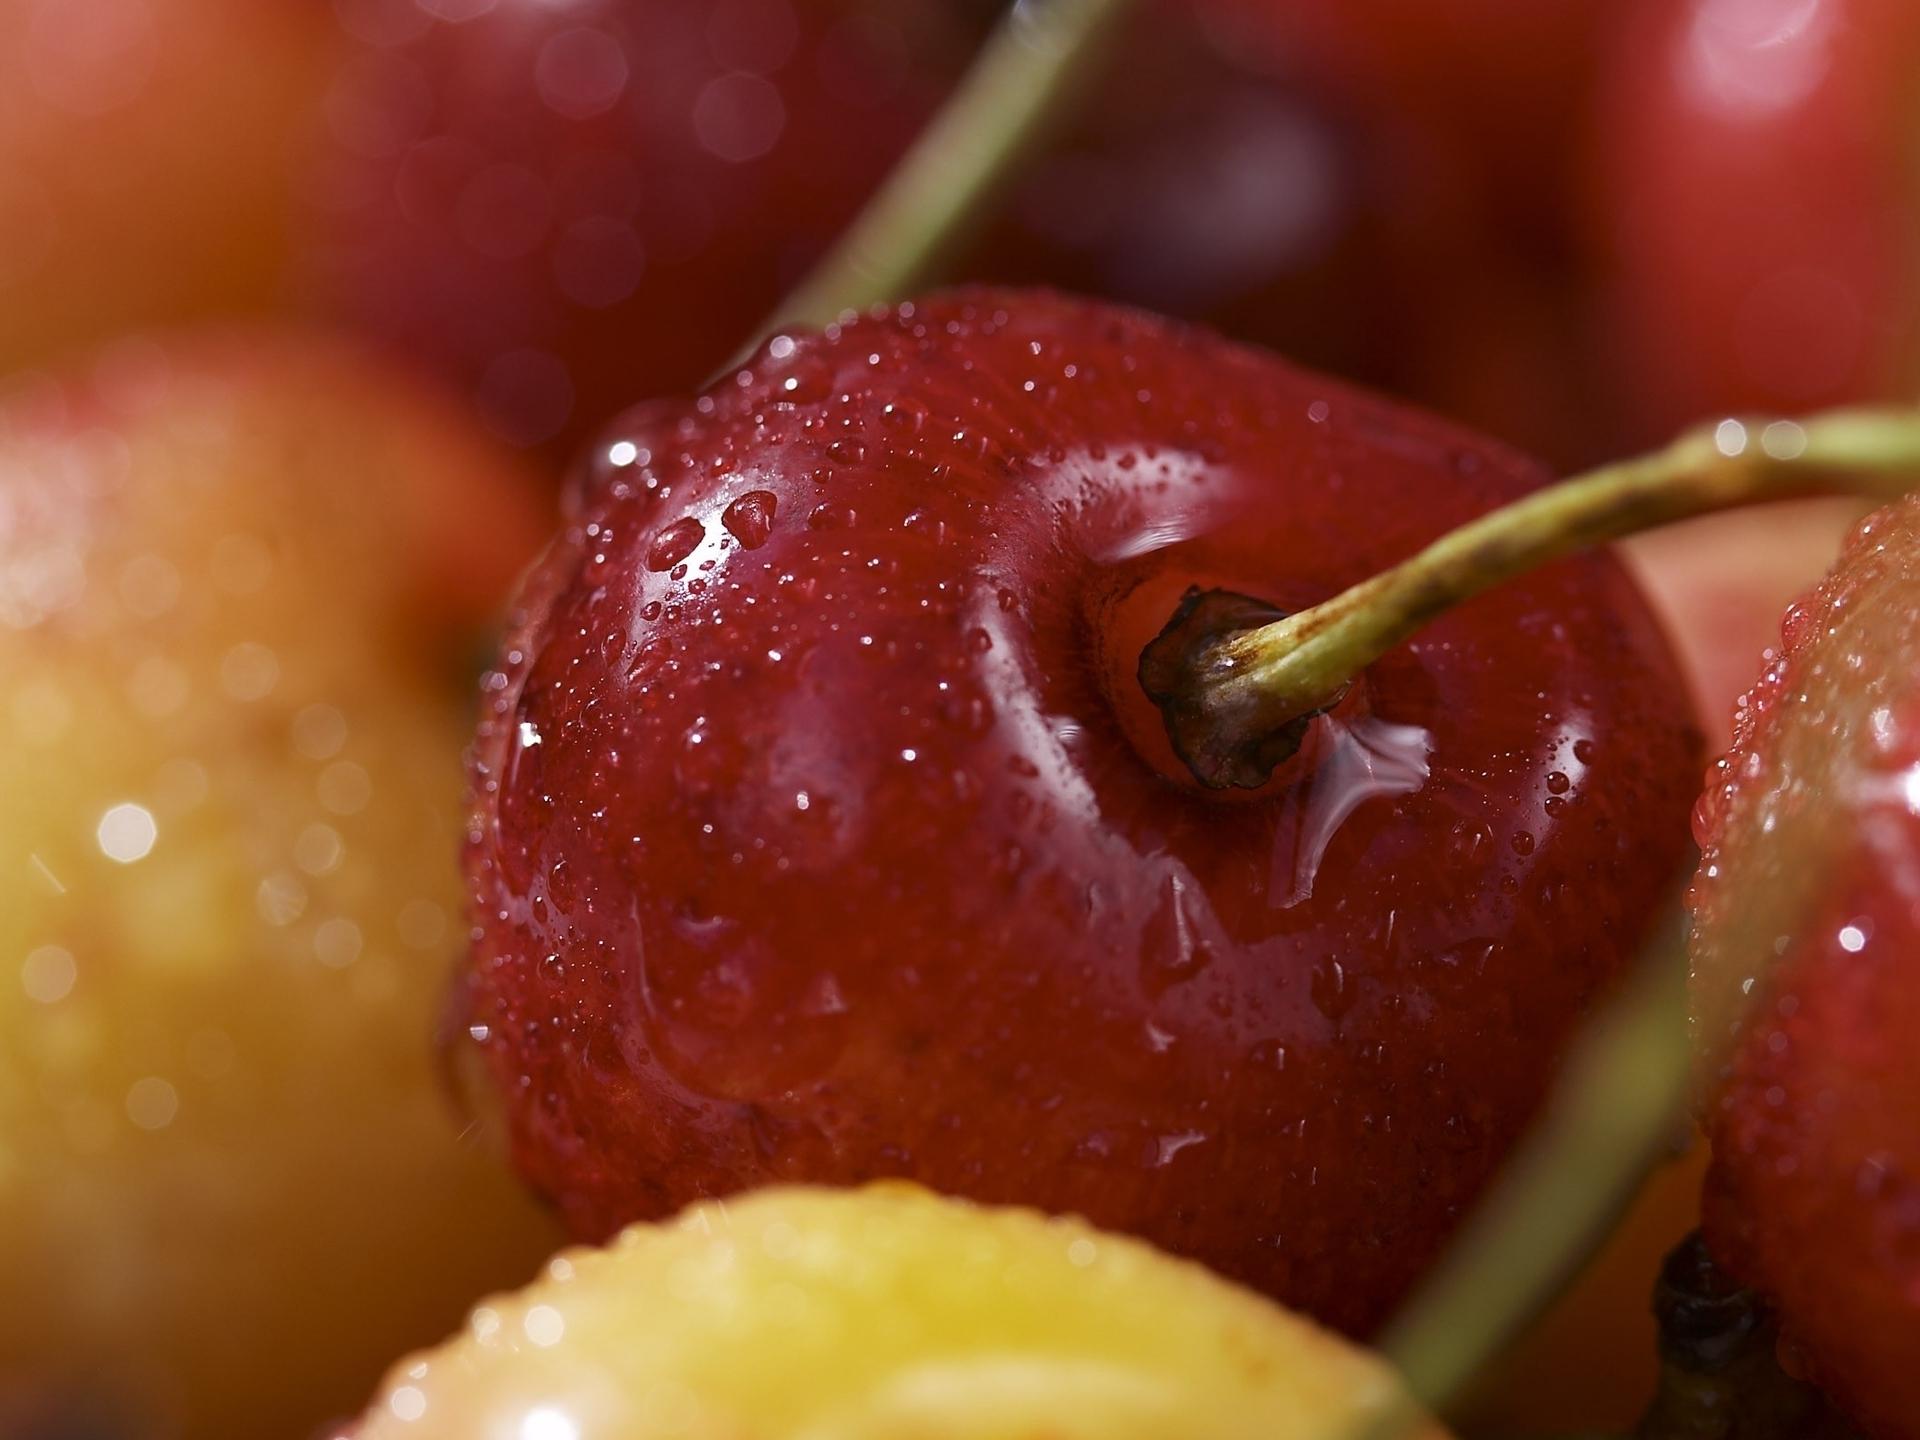 Fruits cherries macro berries (1920x1440)